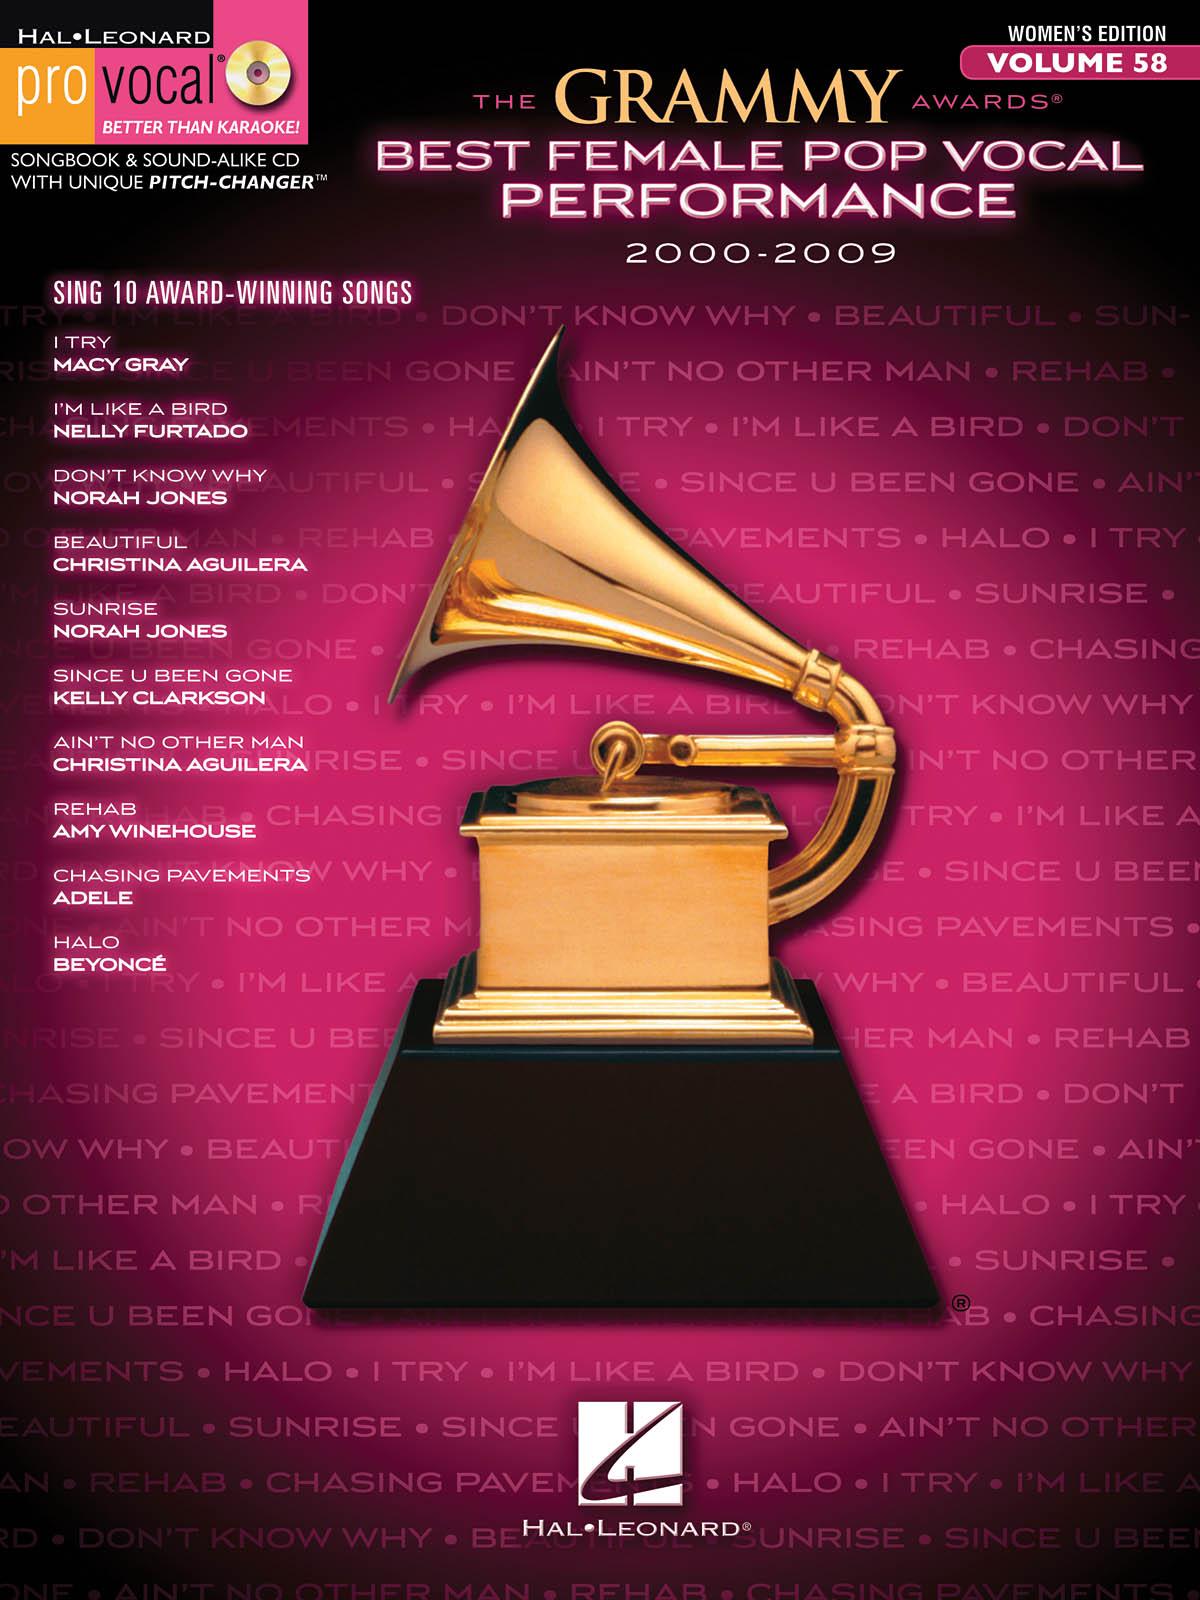 The Grammy Awards Best Female Pop Vocal 2000-2009: Melody  Lyrics and Chords: